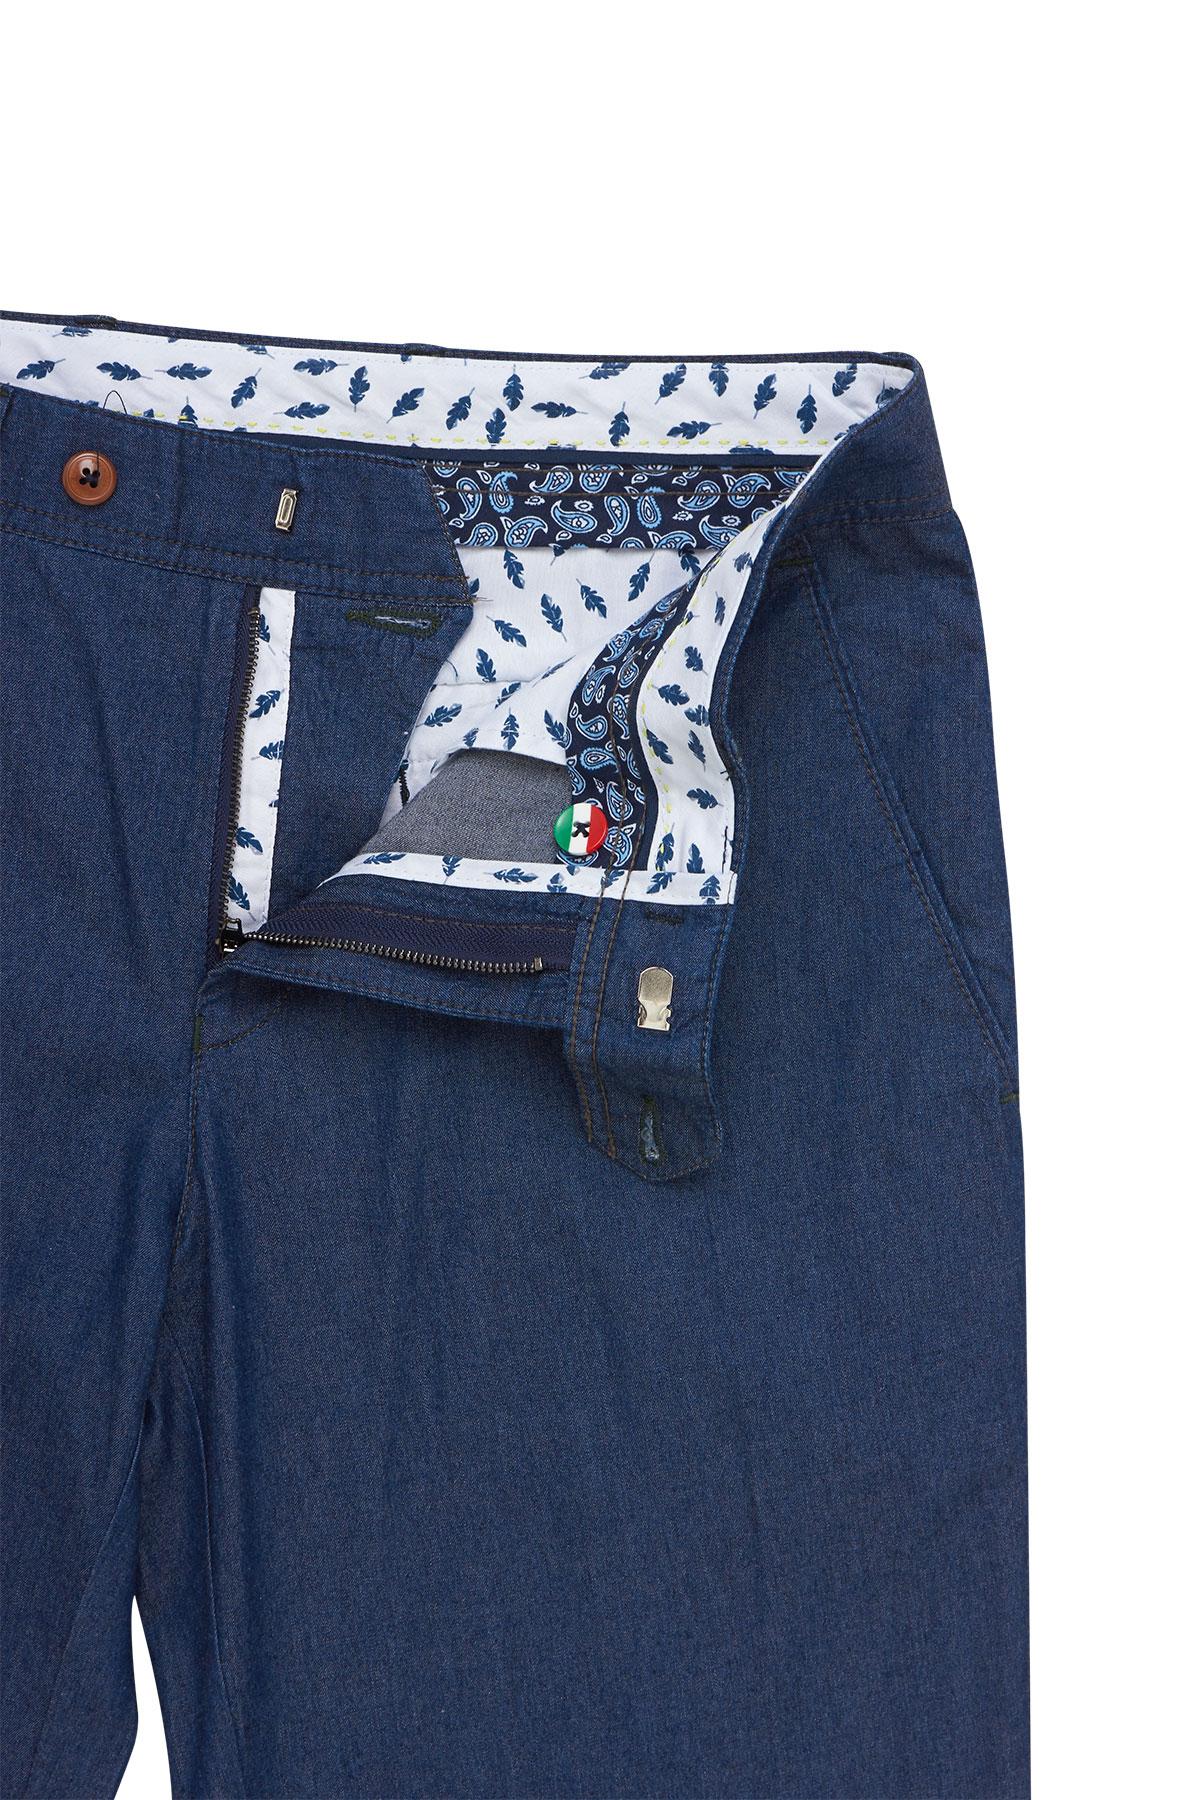 Брюки «chinos» цвета «деним» 18506 Milan-480